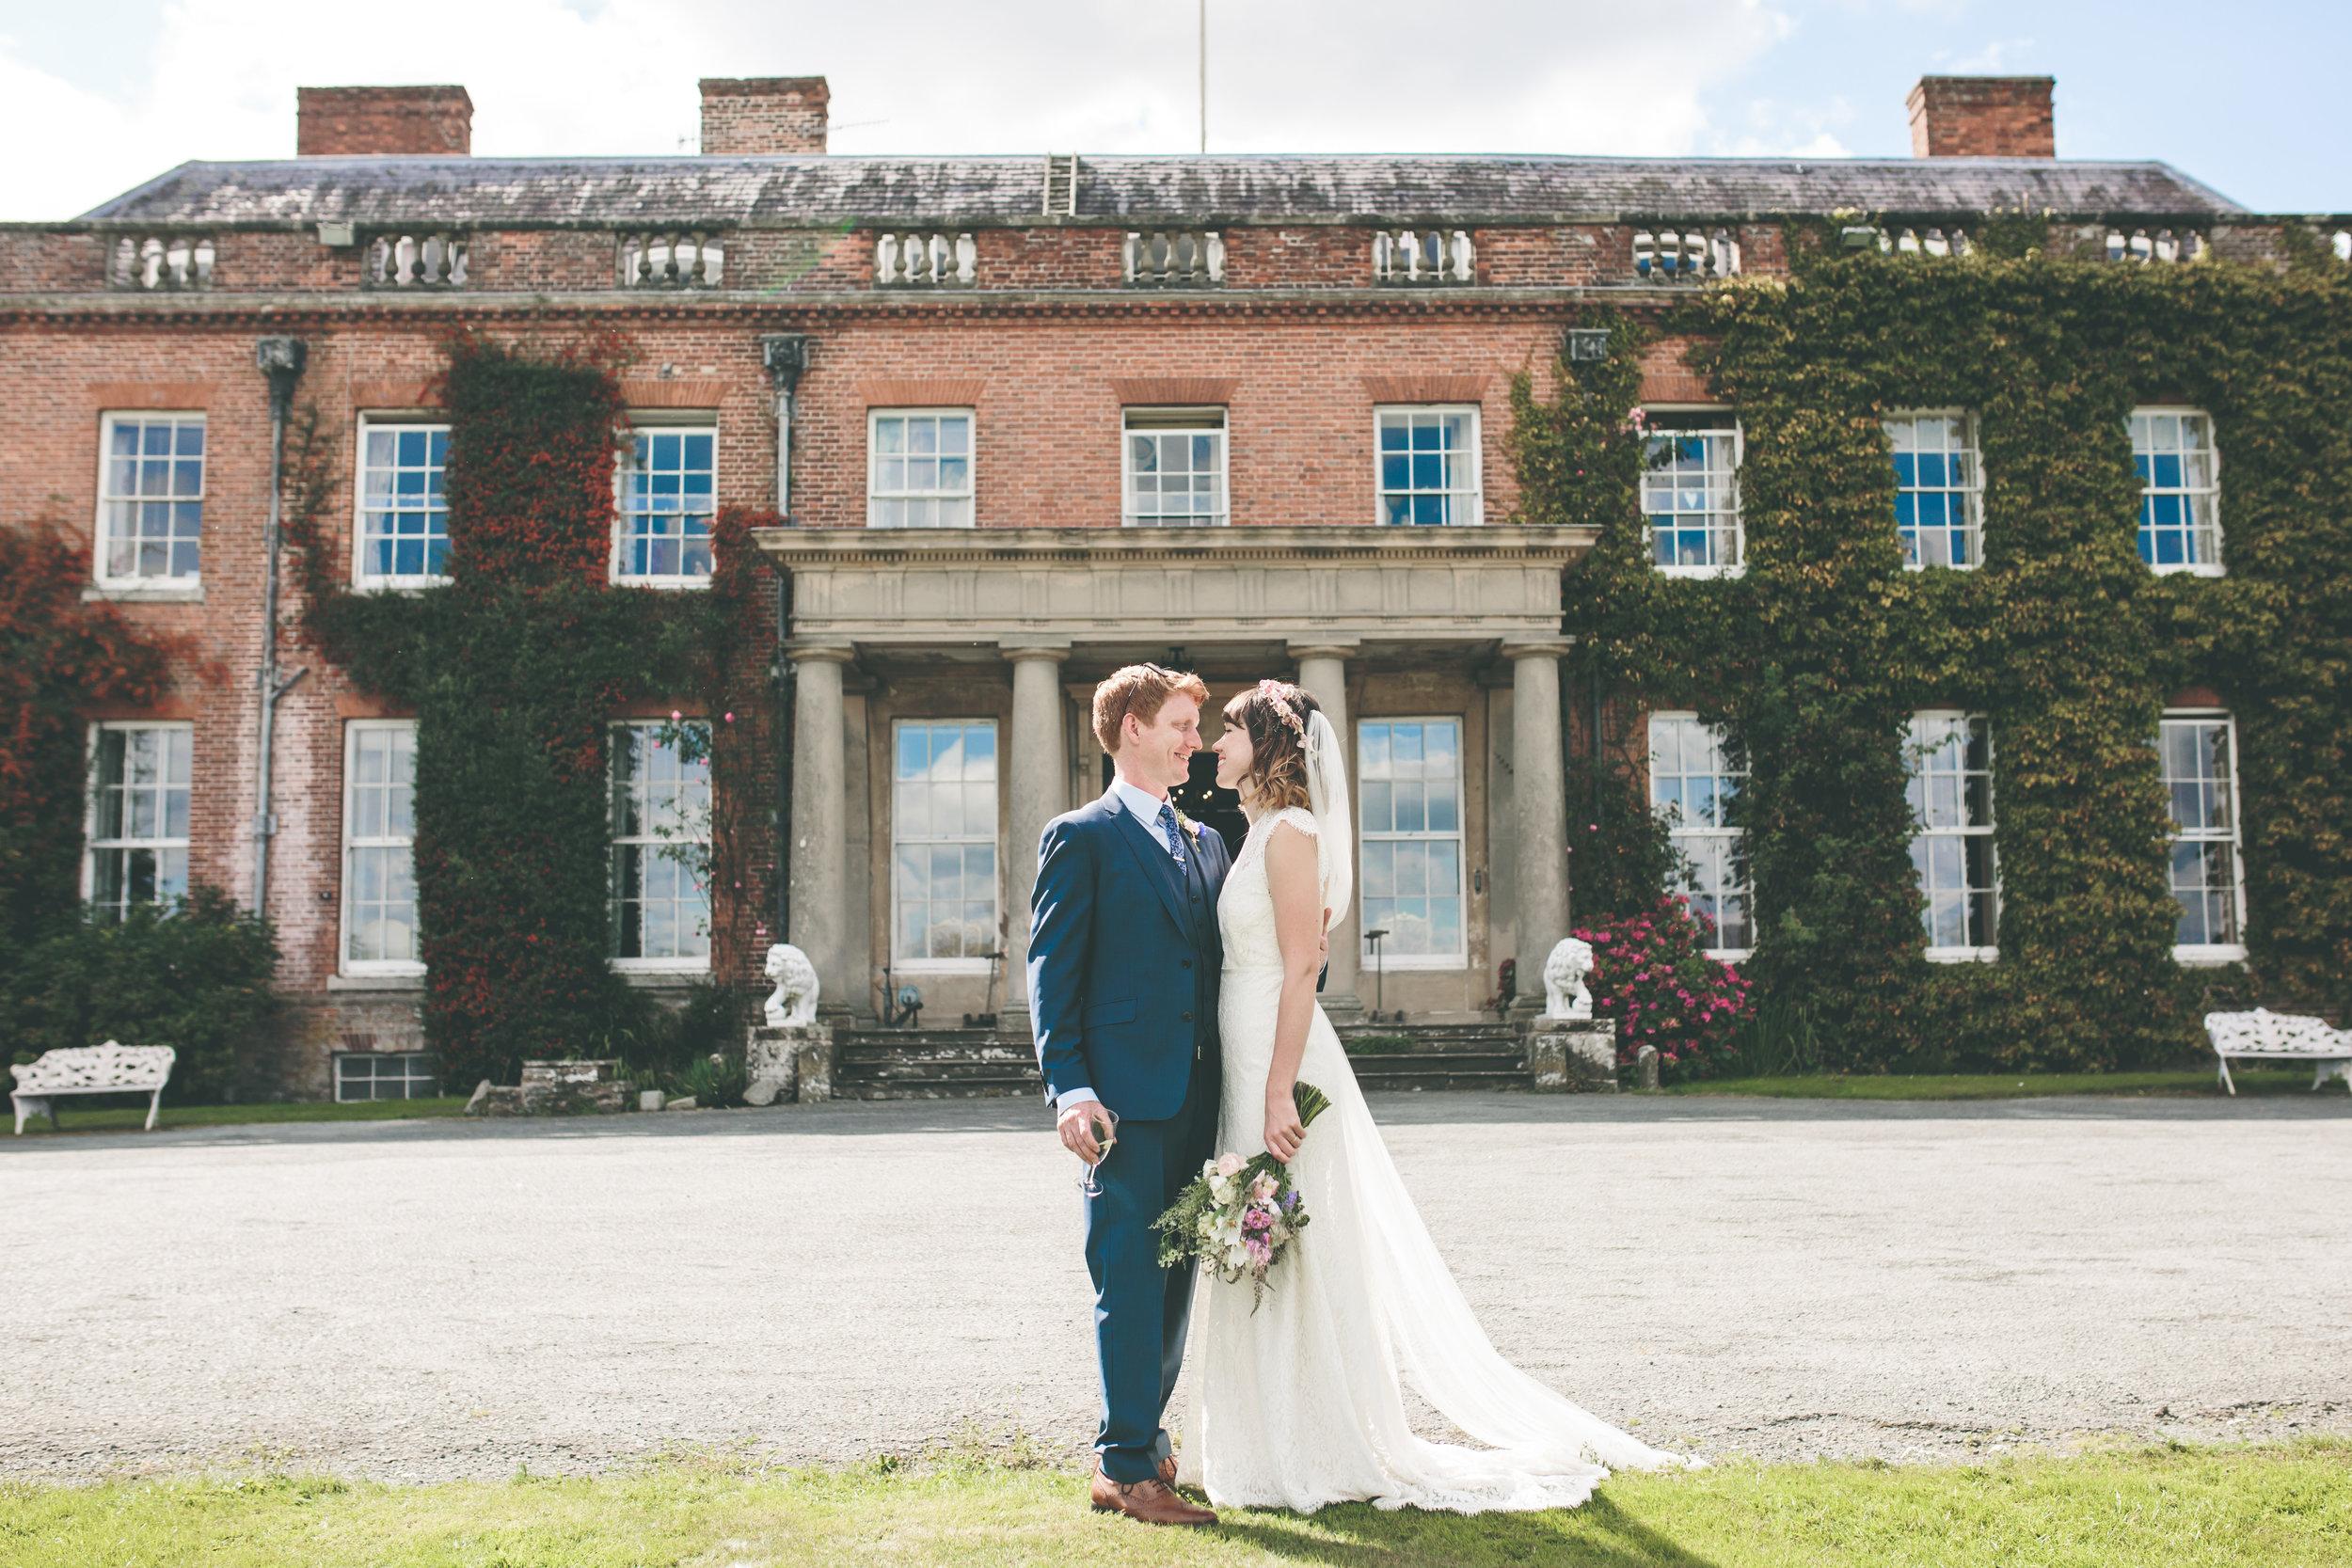 Walcot_Hall_Wedding_Photography_Jesse_Rose_-255.jpg